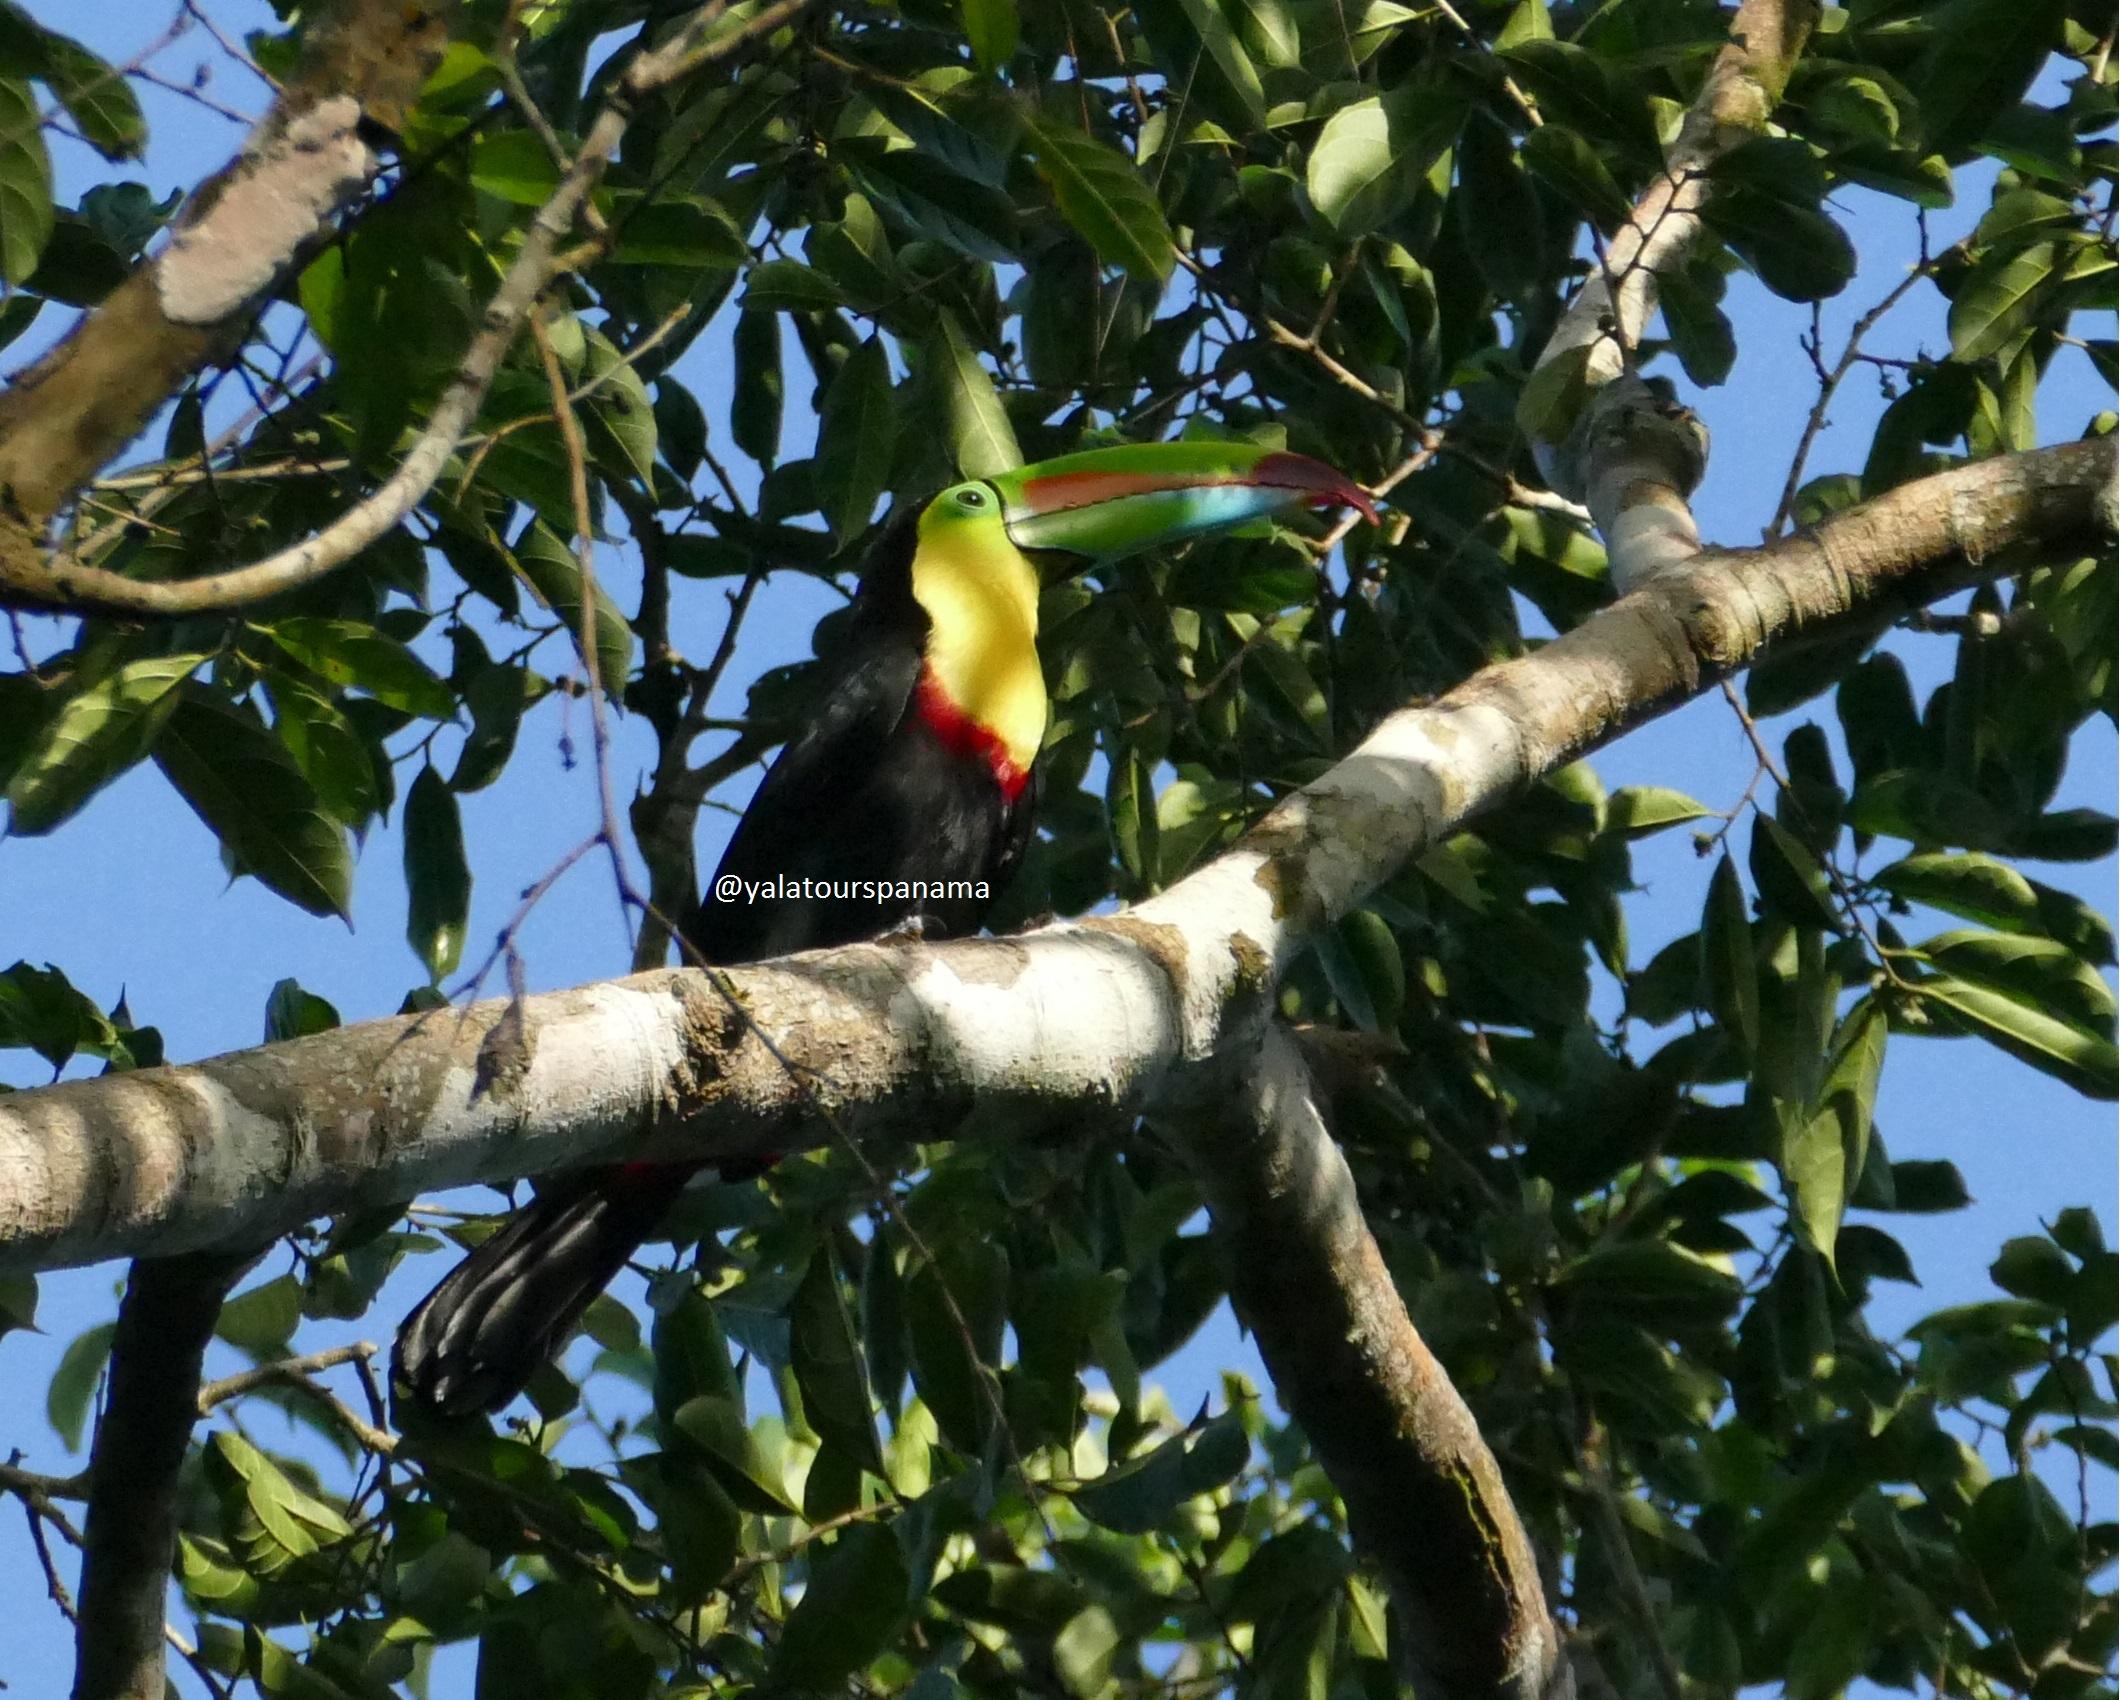 Birding in Panama Toucan Yala Tours Panama